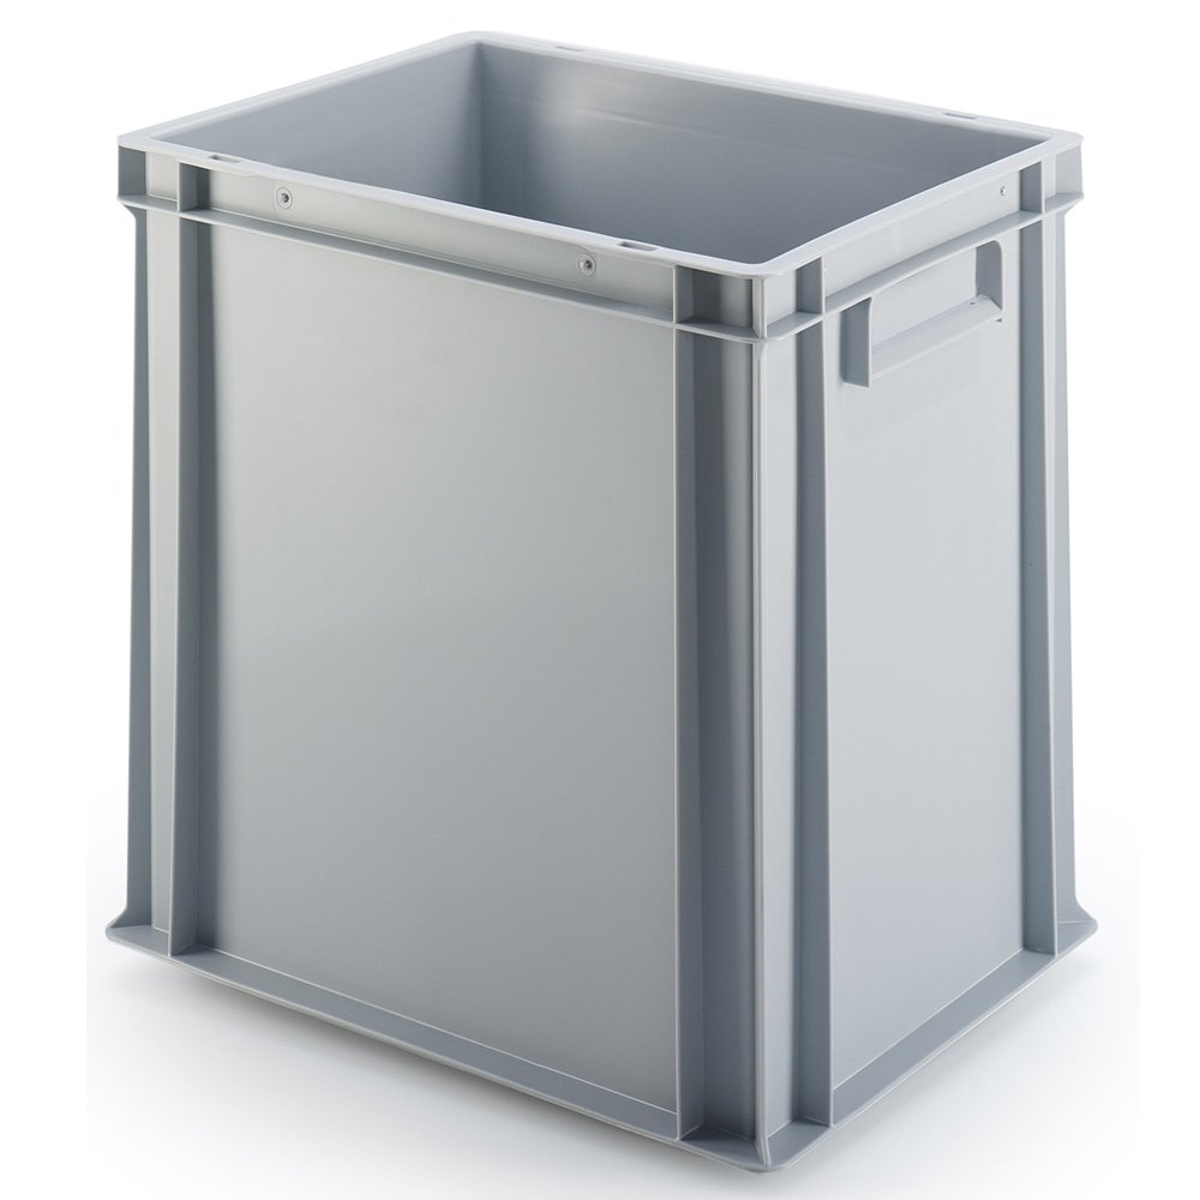 unista lagerboxen 40 x 30 x 40 cm schattec technischer. Black Bedroom Furniture Sets. Home Design Ideas